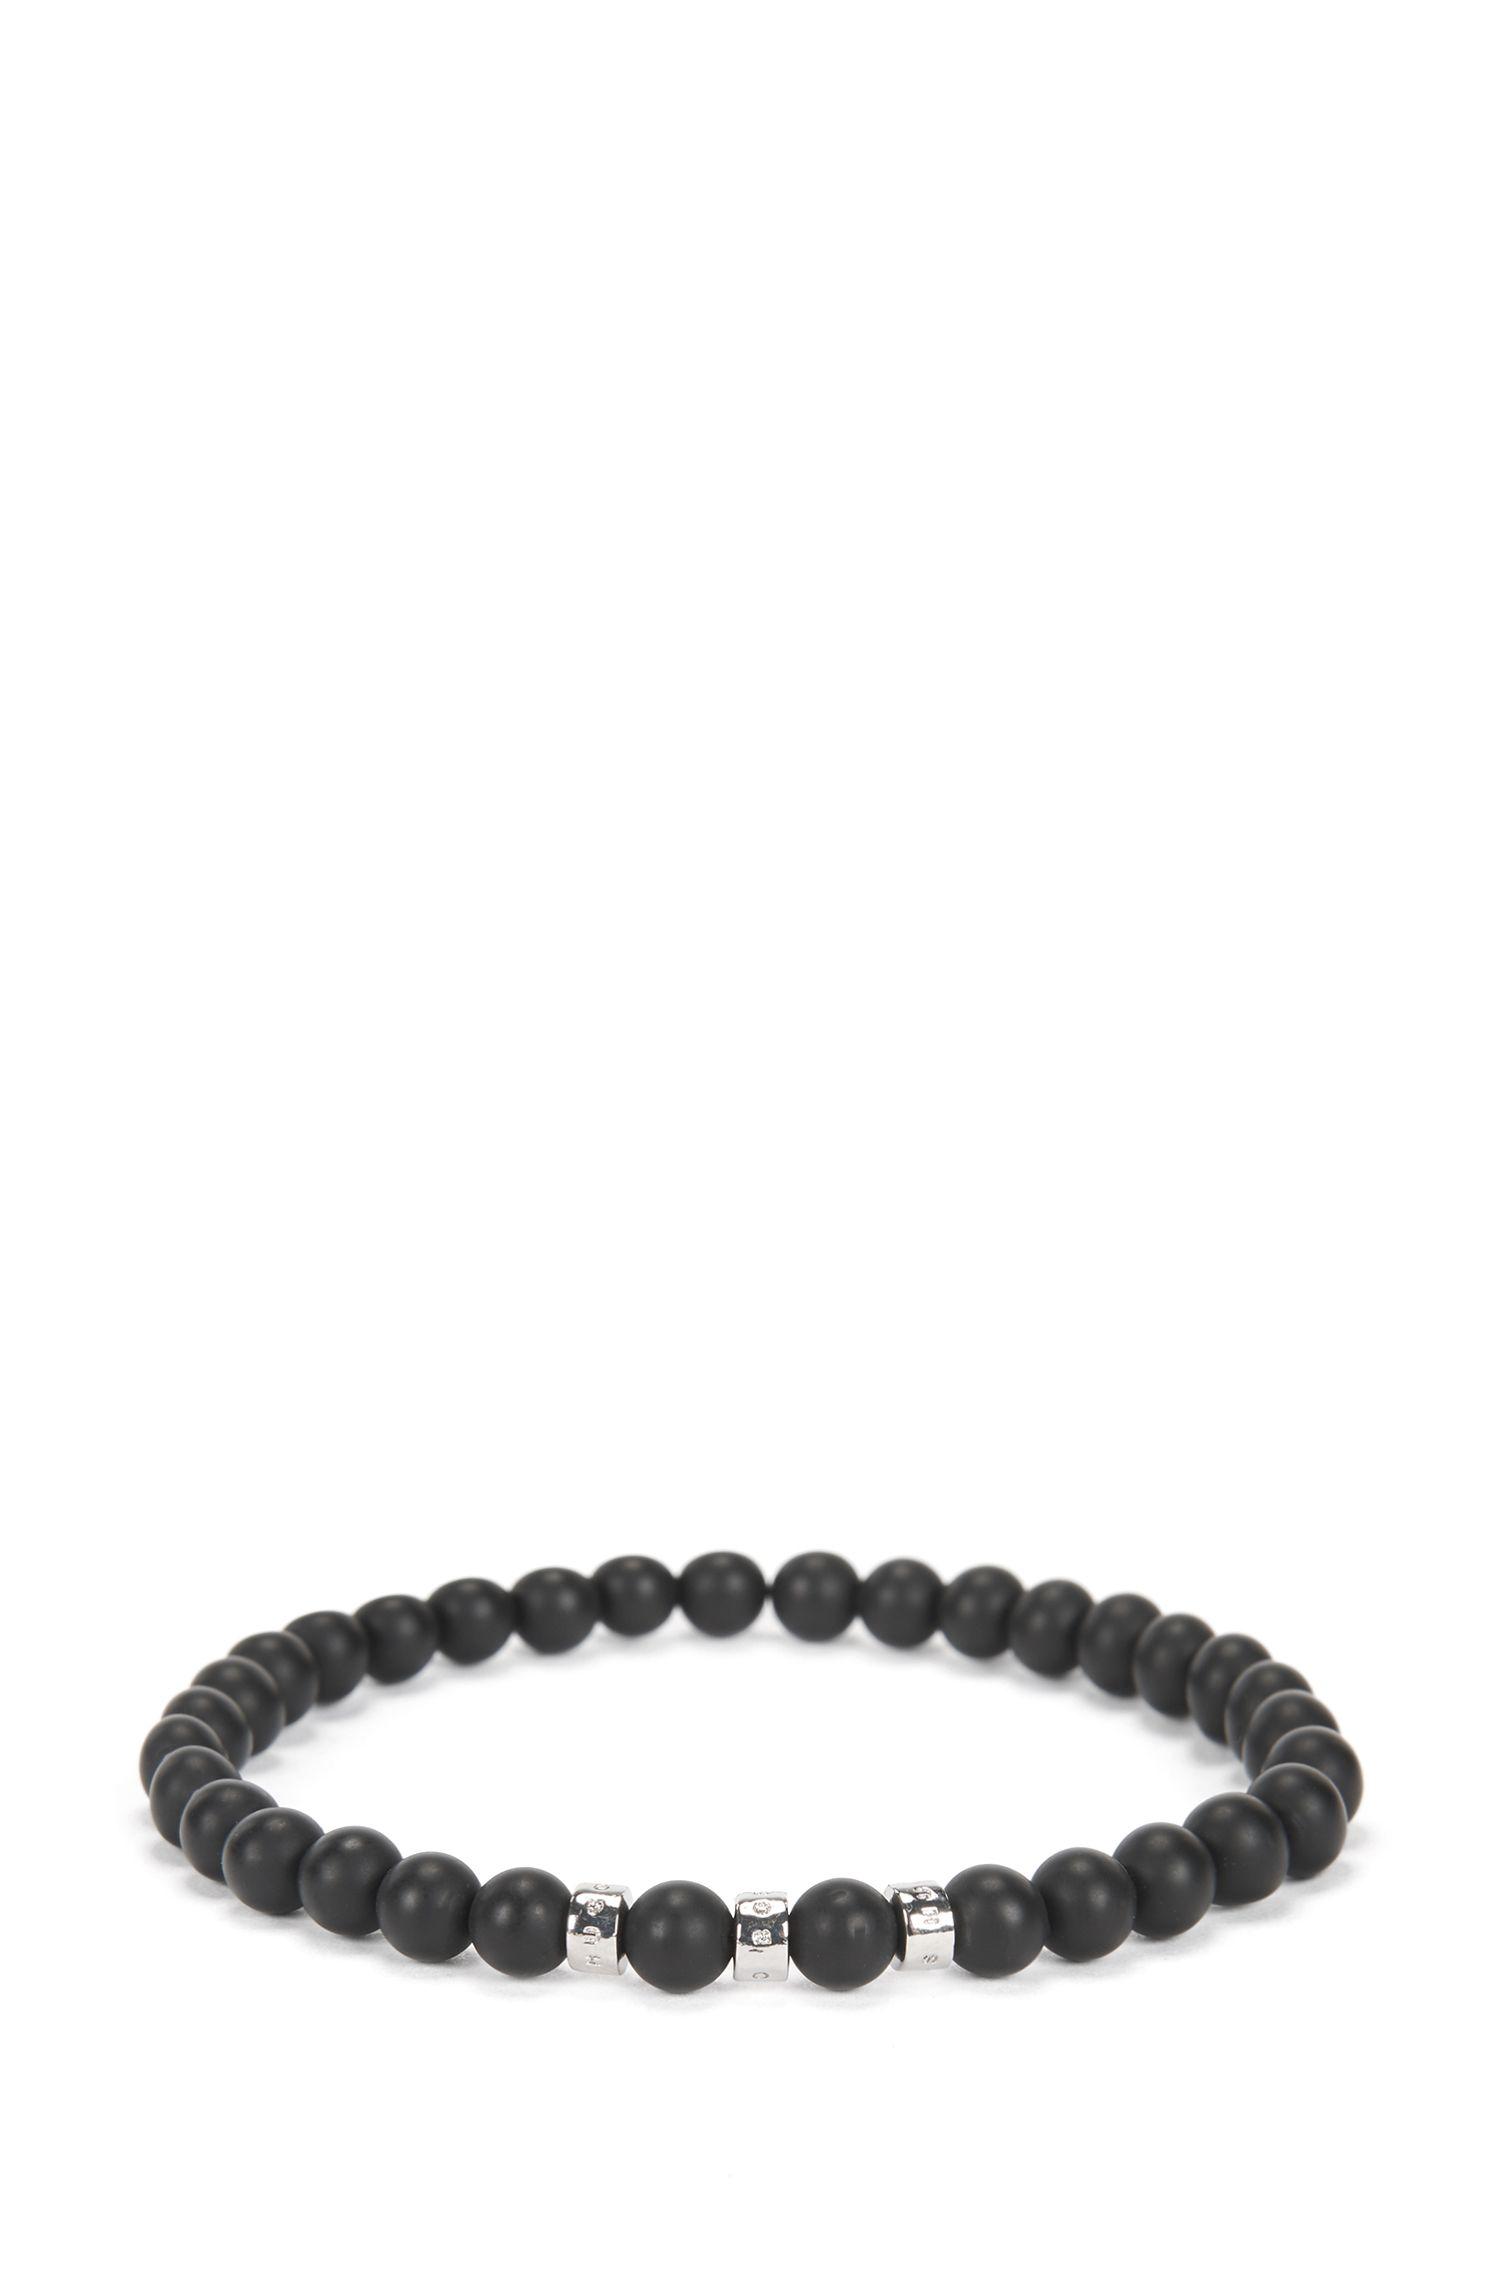 Agate-stone bracelet with metal logo beads